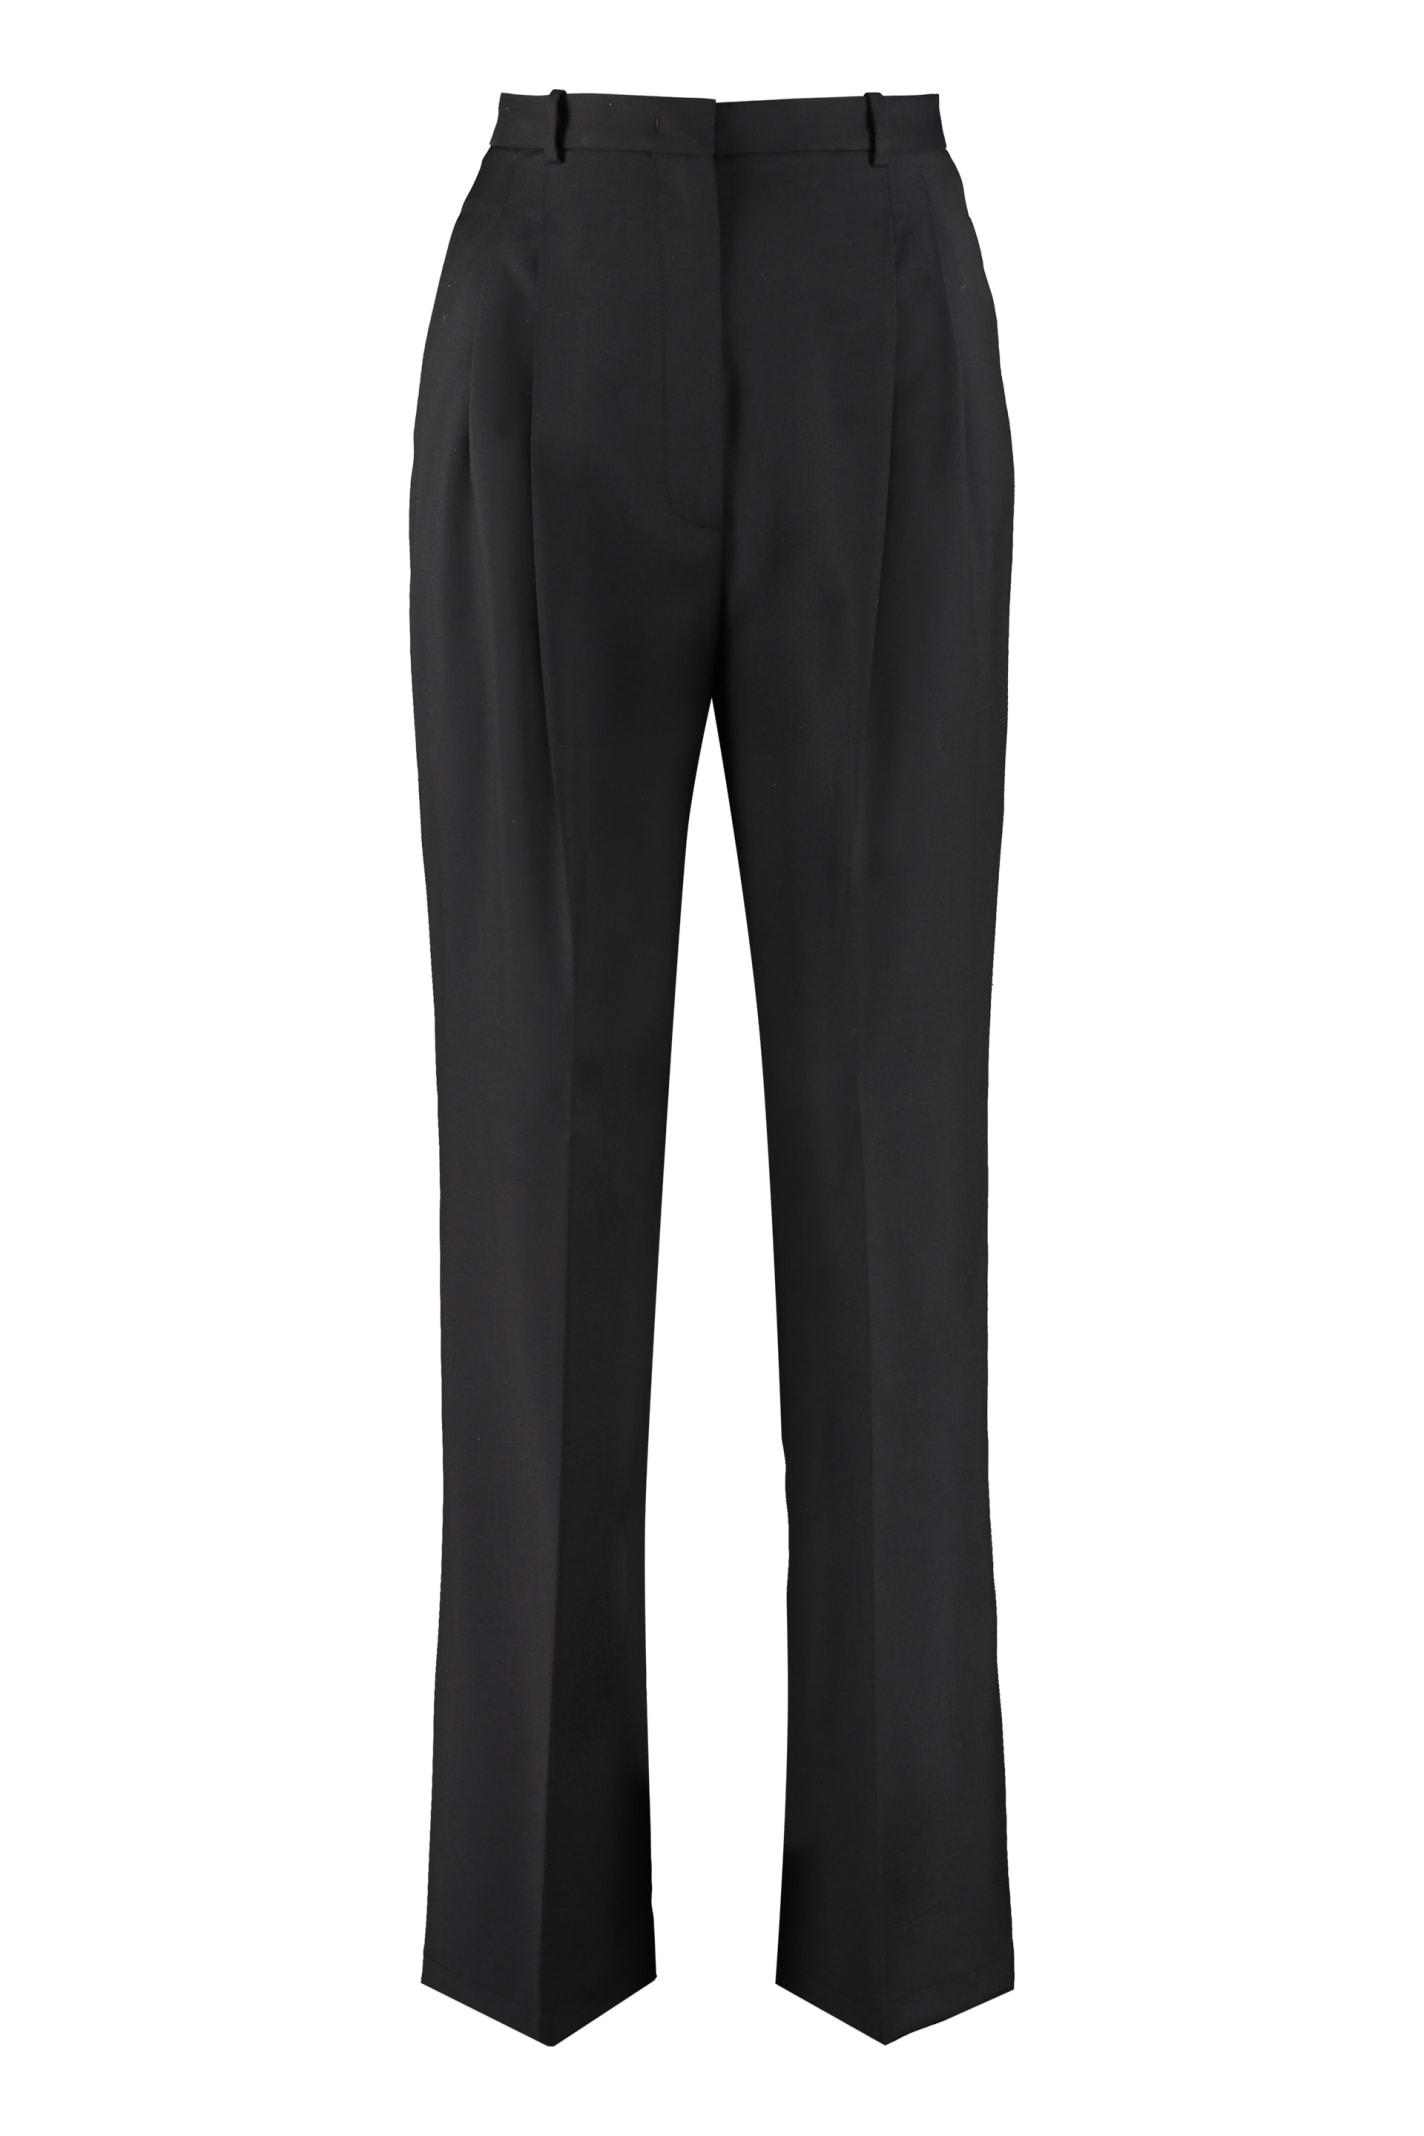 Fabiana Filippi Wool Wide-leg Trousers